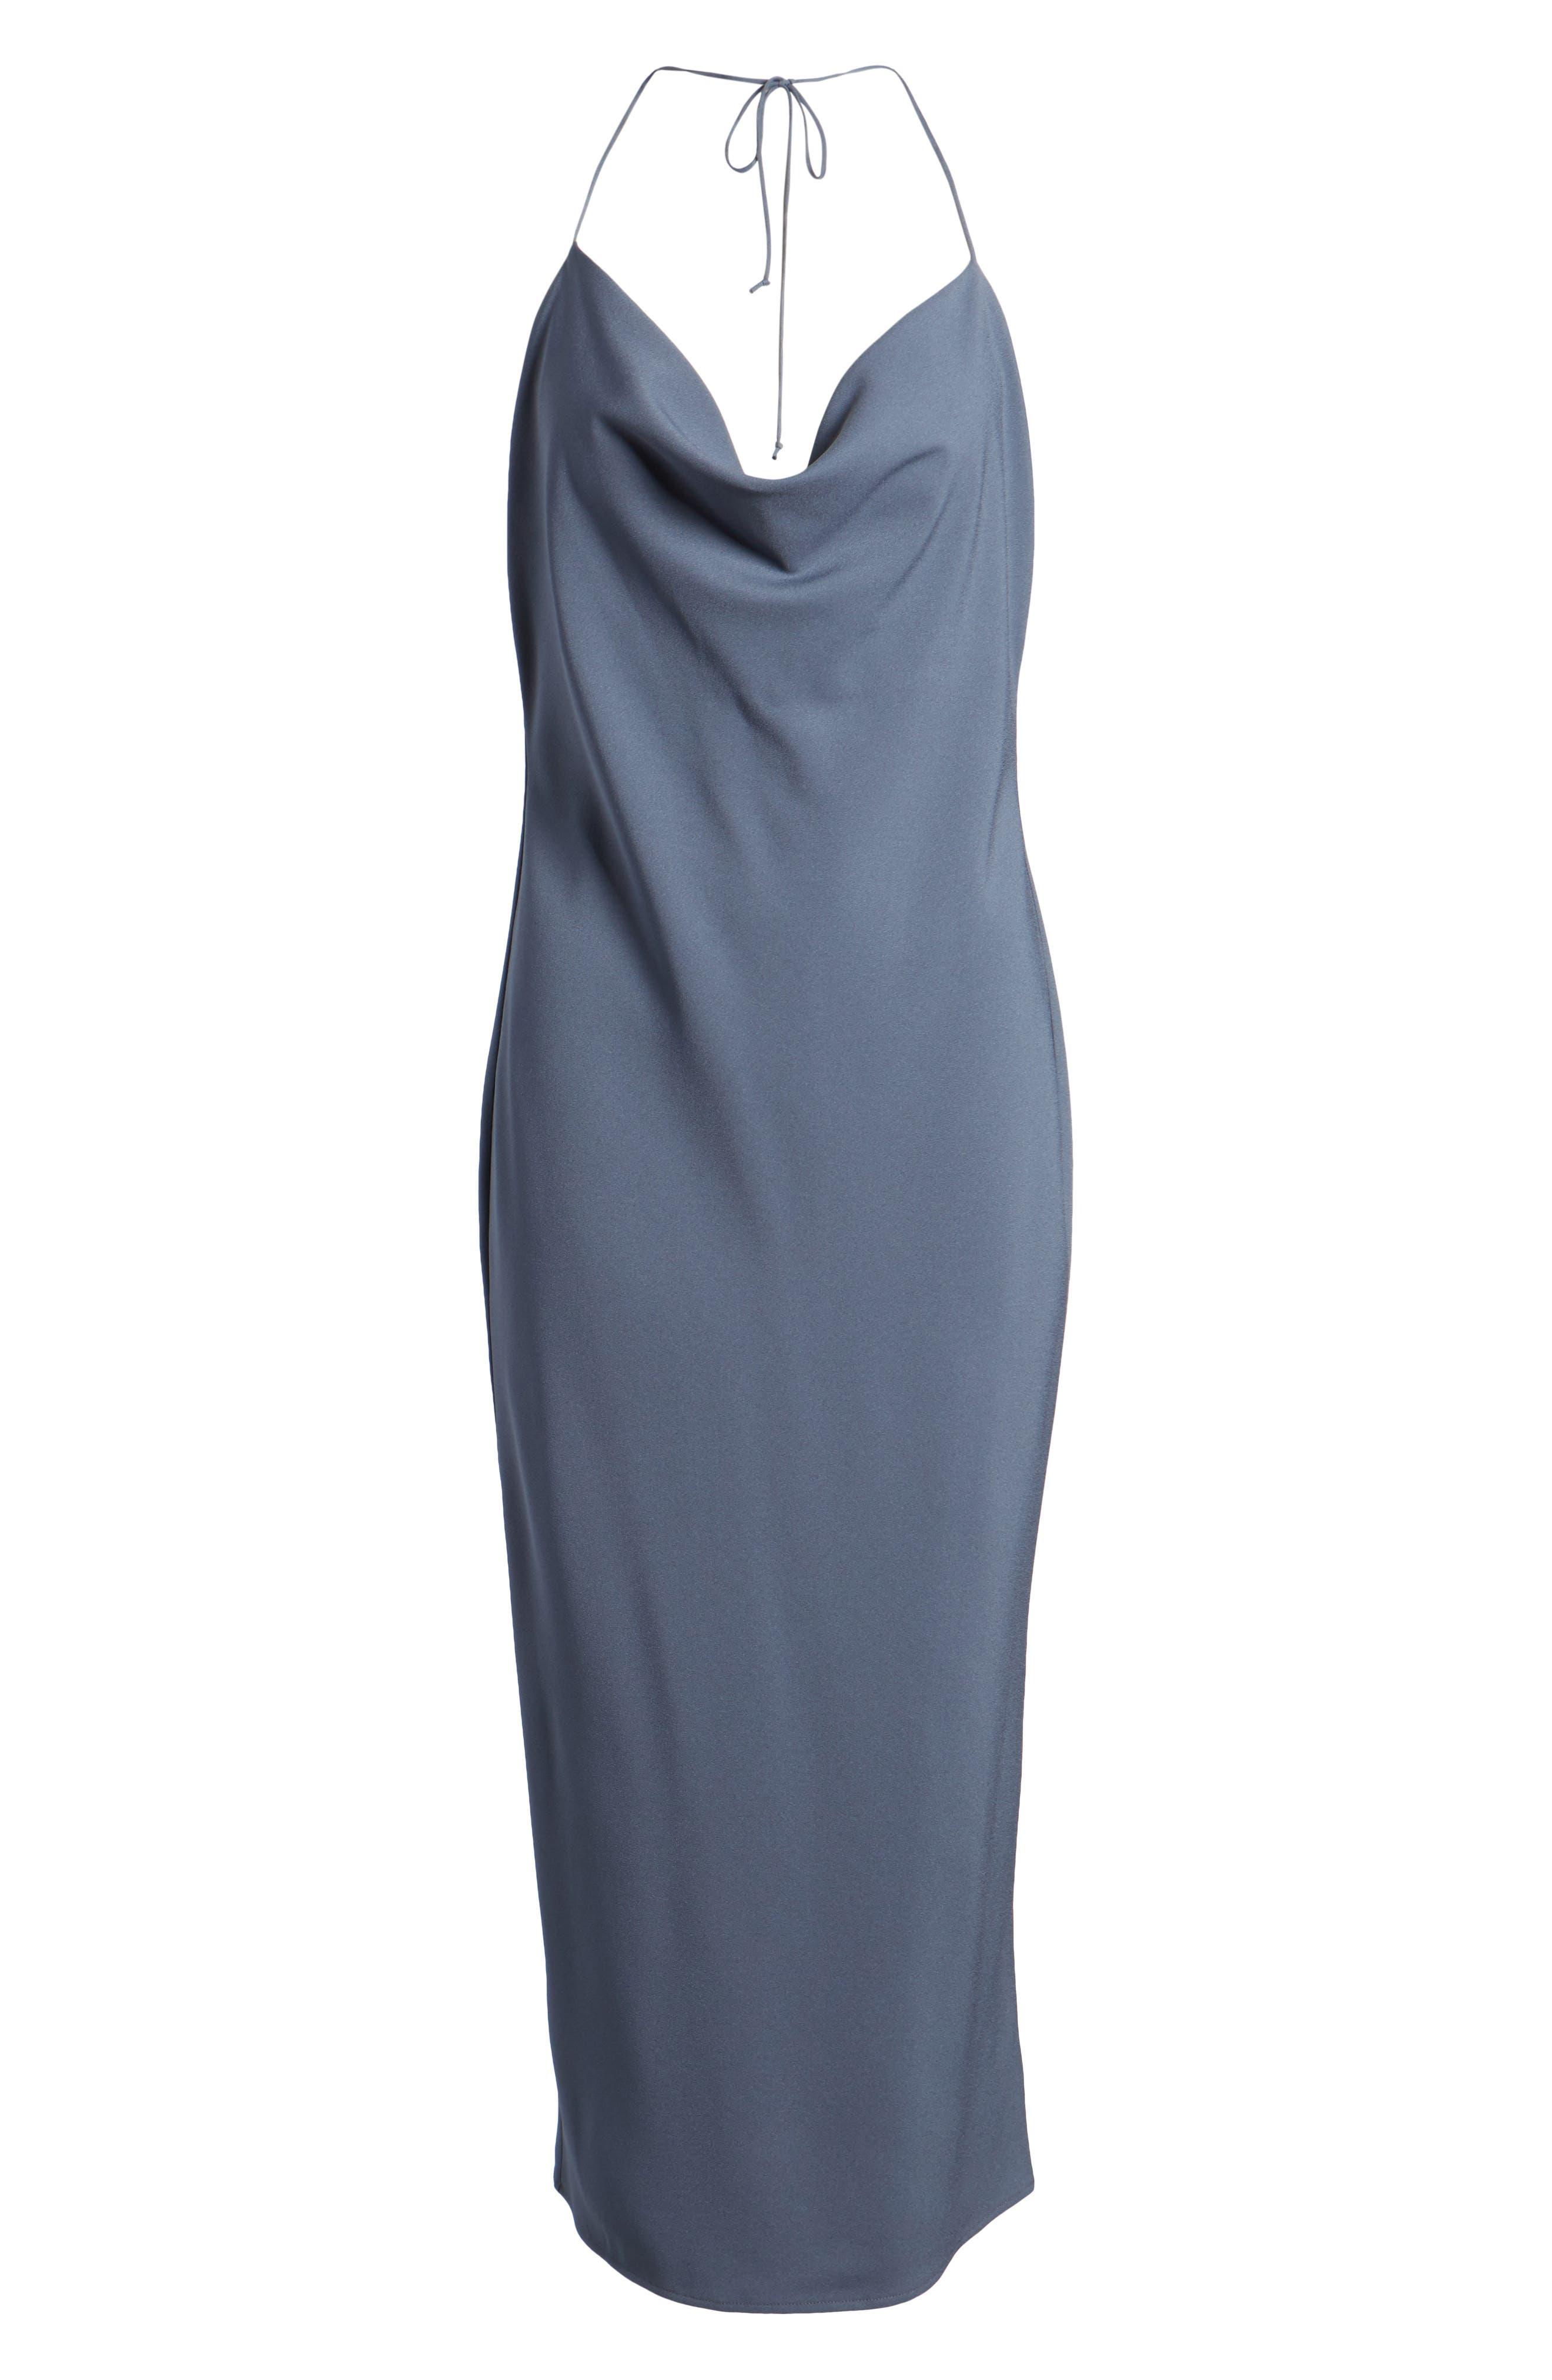 Cowl Neck Midi Dress,                             Alternate thumbnail 6, color,                             Grey Grisaille